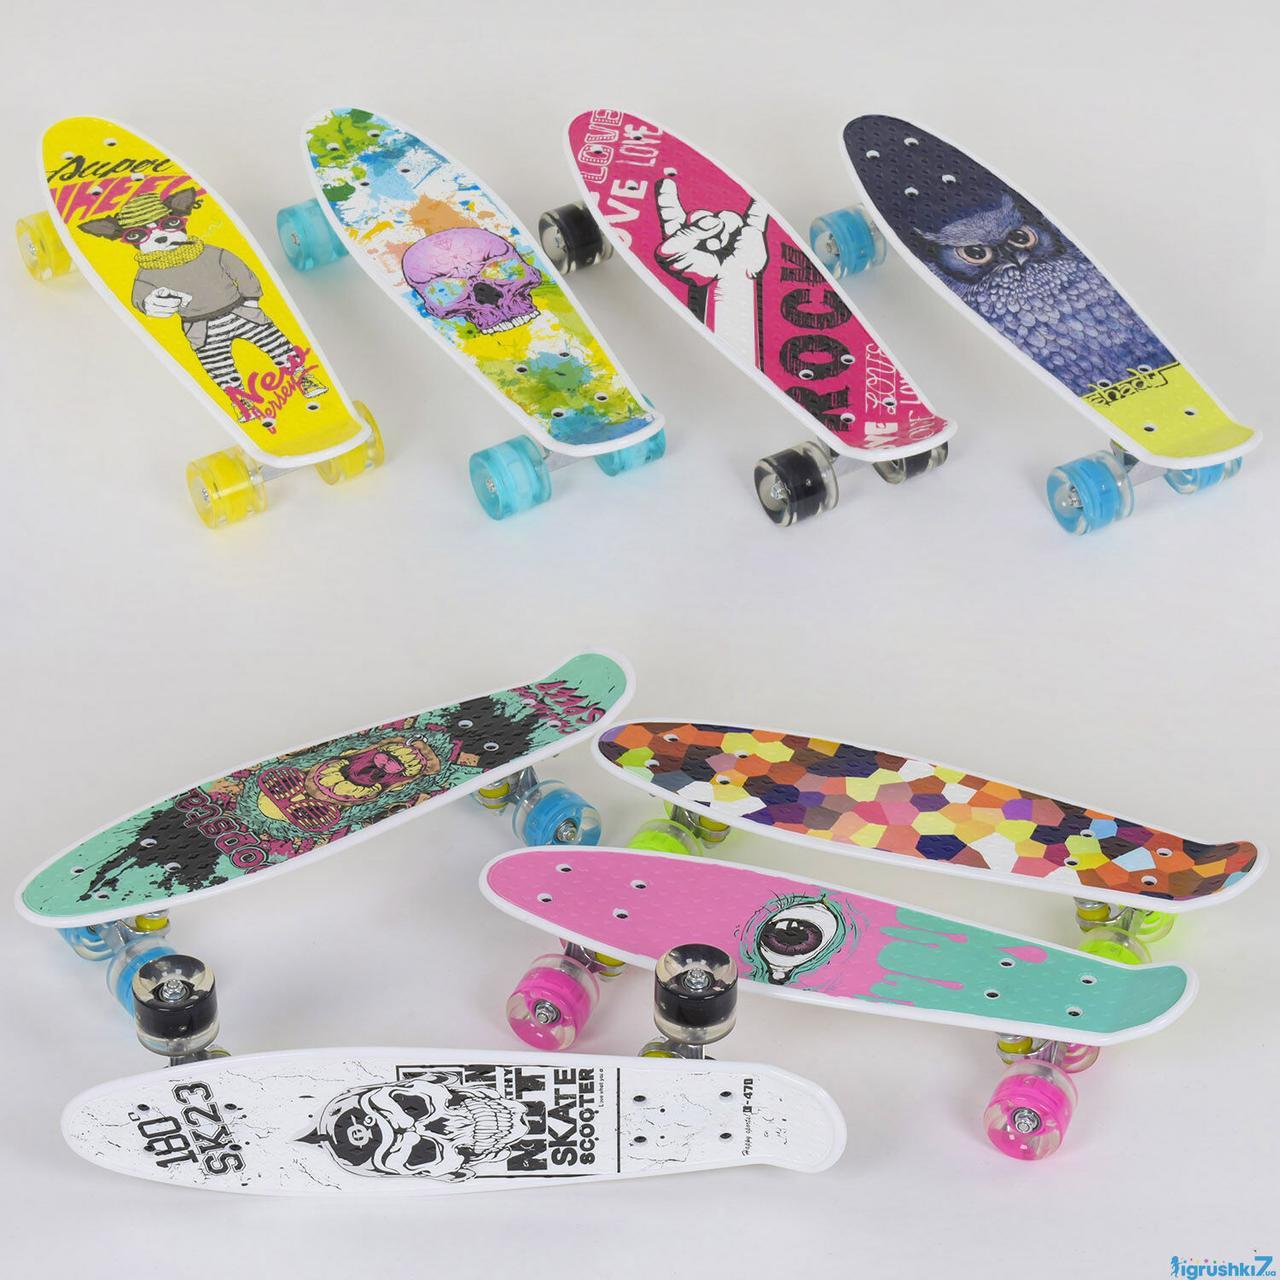 Скейт Р 22661  Best Board, доска=55см, колёса PU, СВЕТЯТСЯ, d=6см